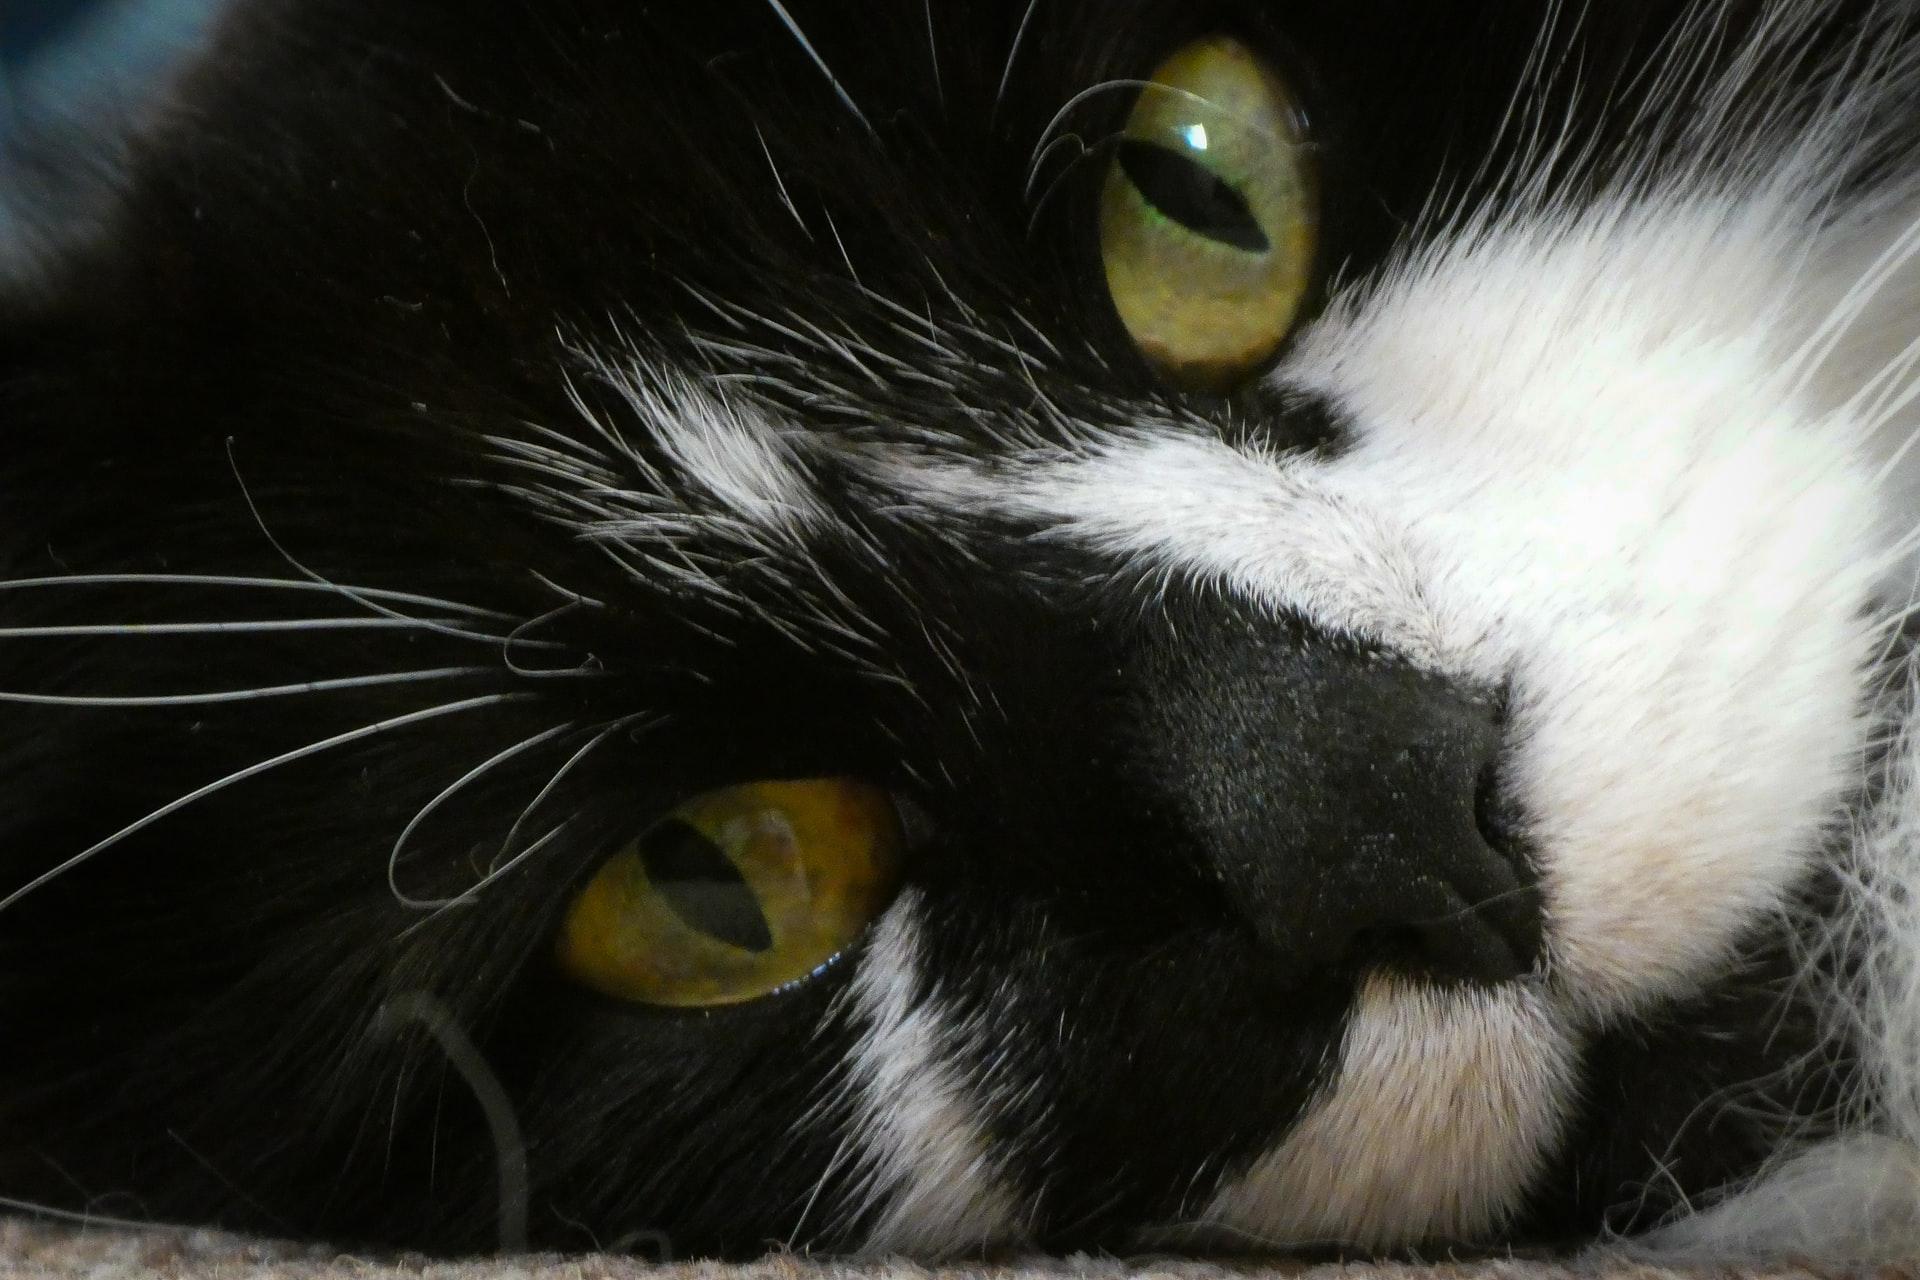 maiores racas de gatos - ragdoll